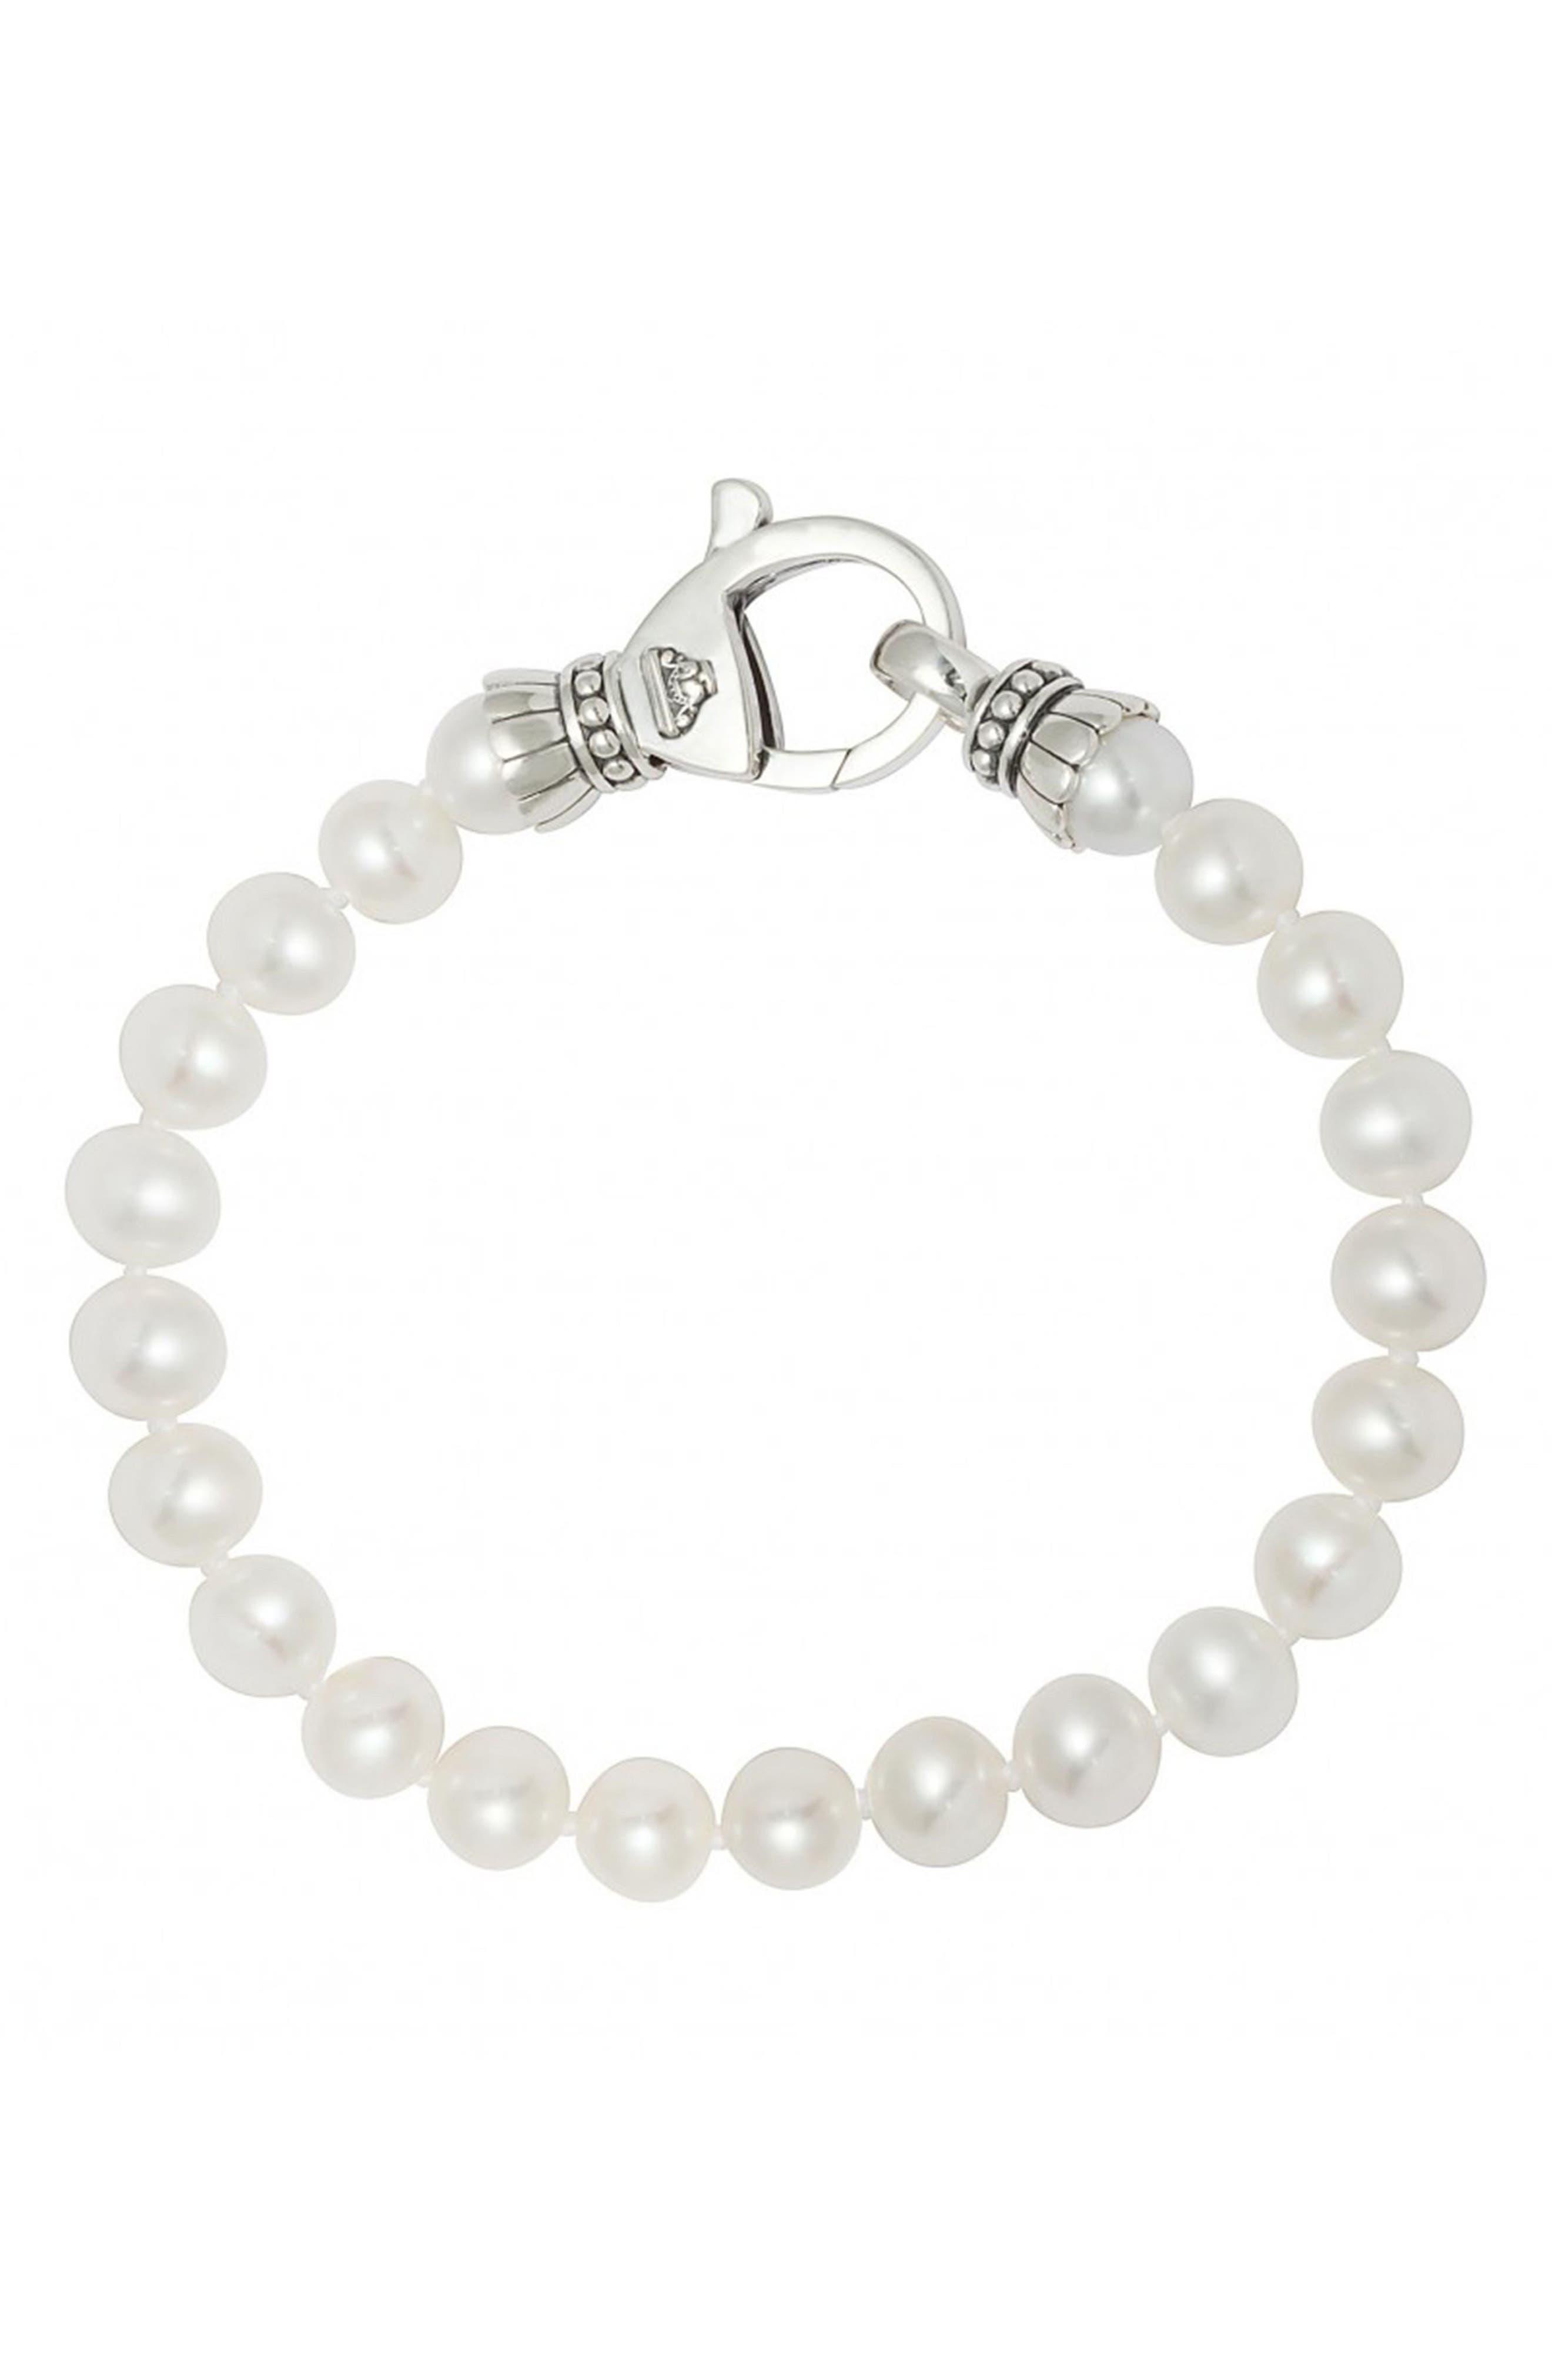 LAGOS 'Luna' 7.5mm Pearl Bracelet